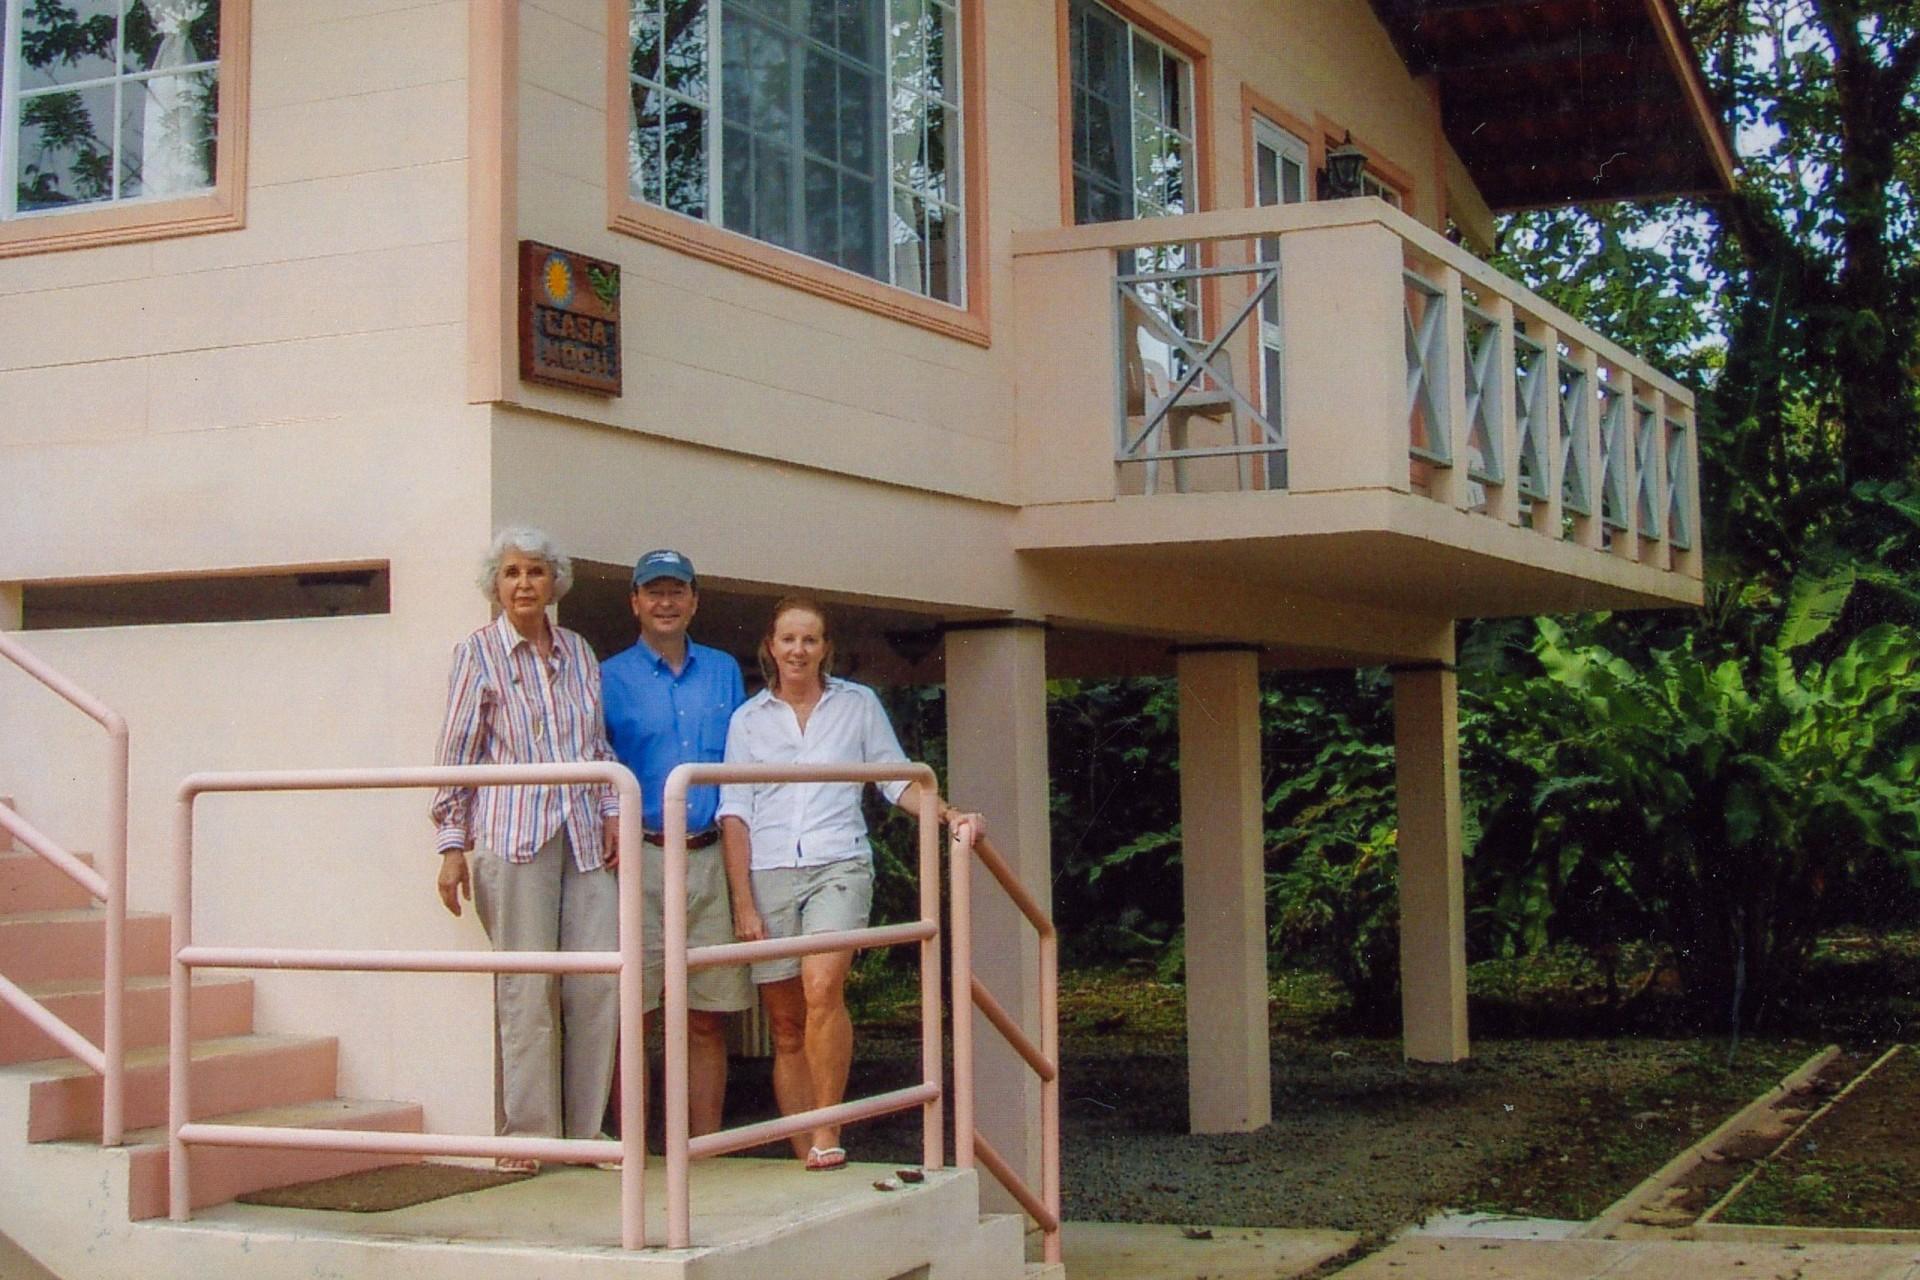 Lisina Hoch's generosity spanned decades